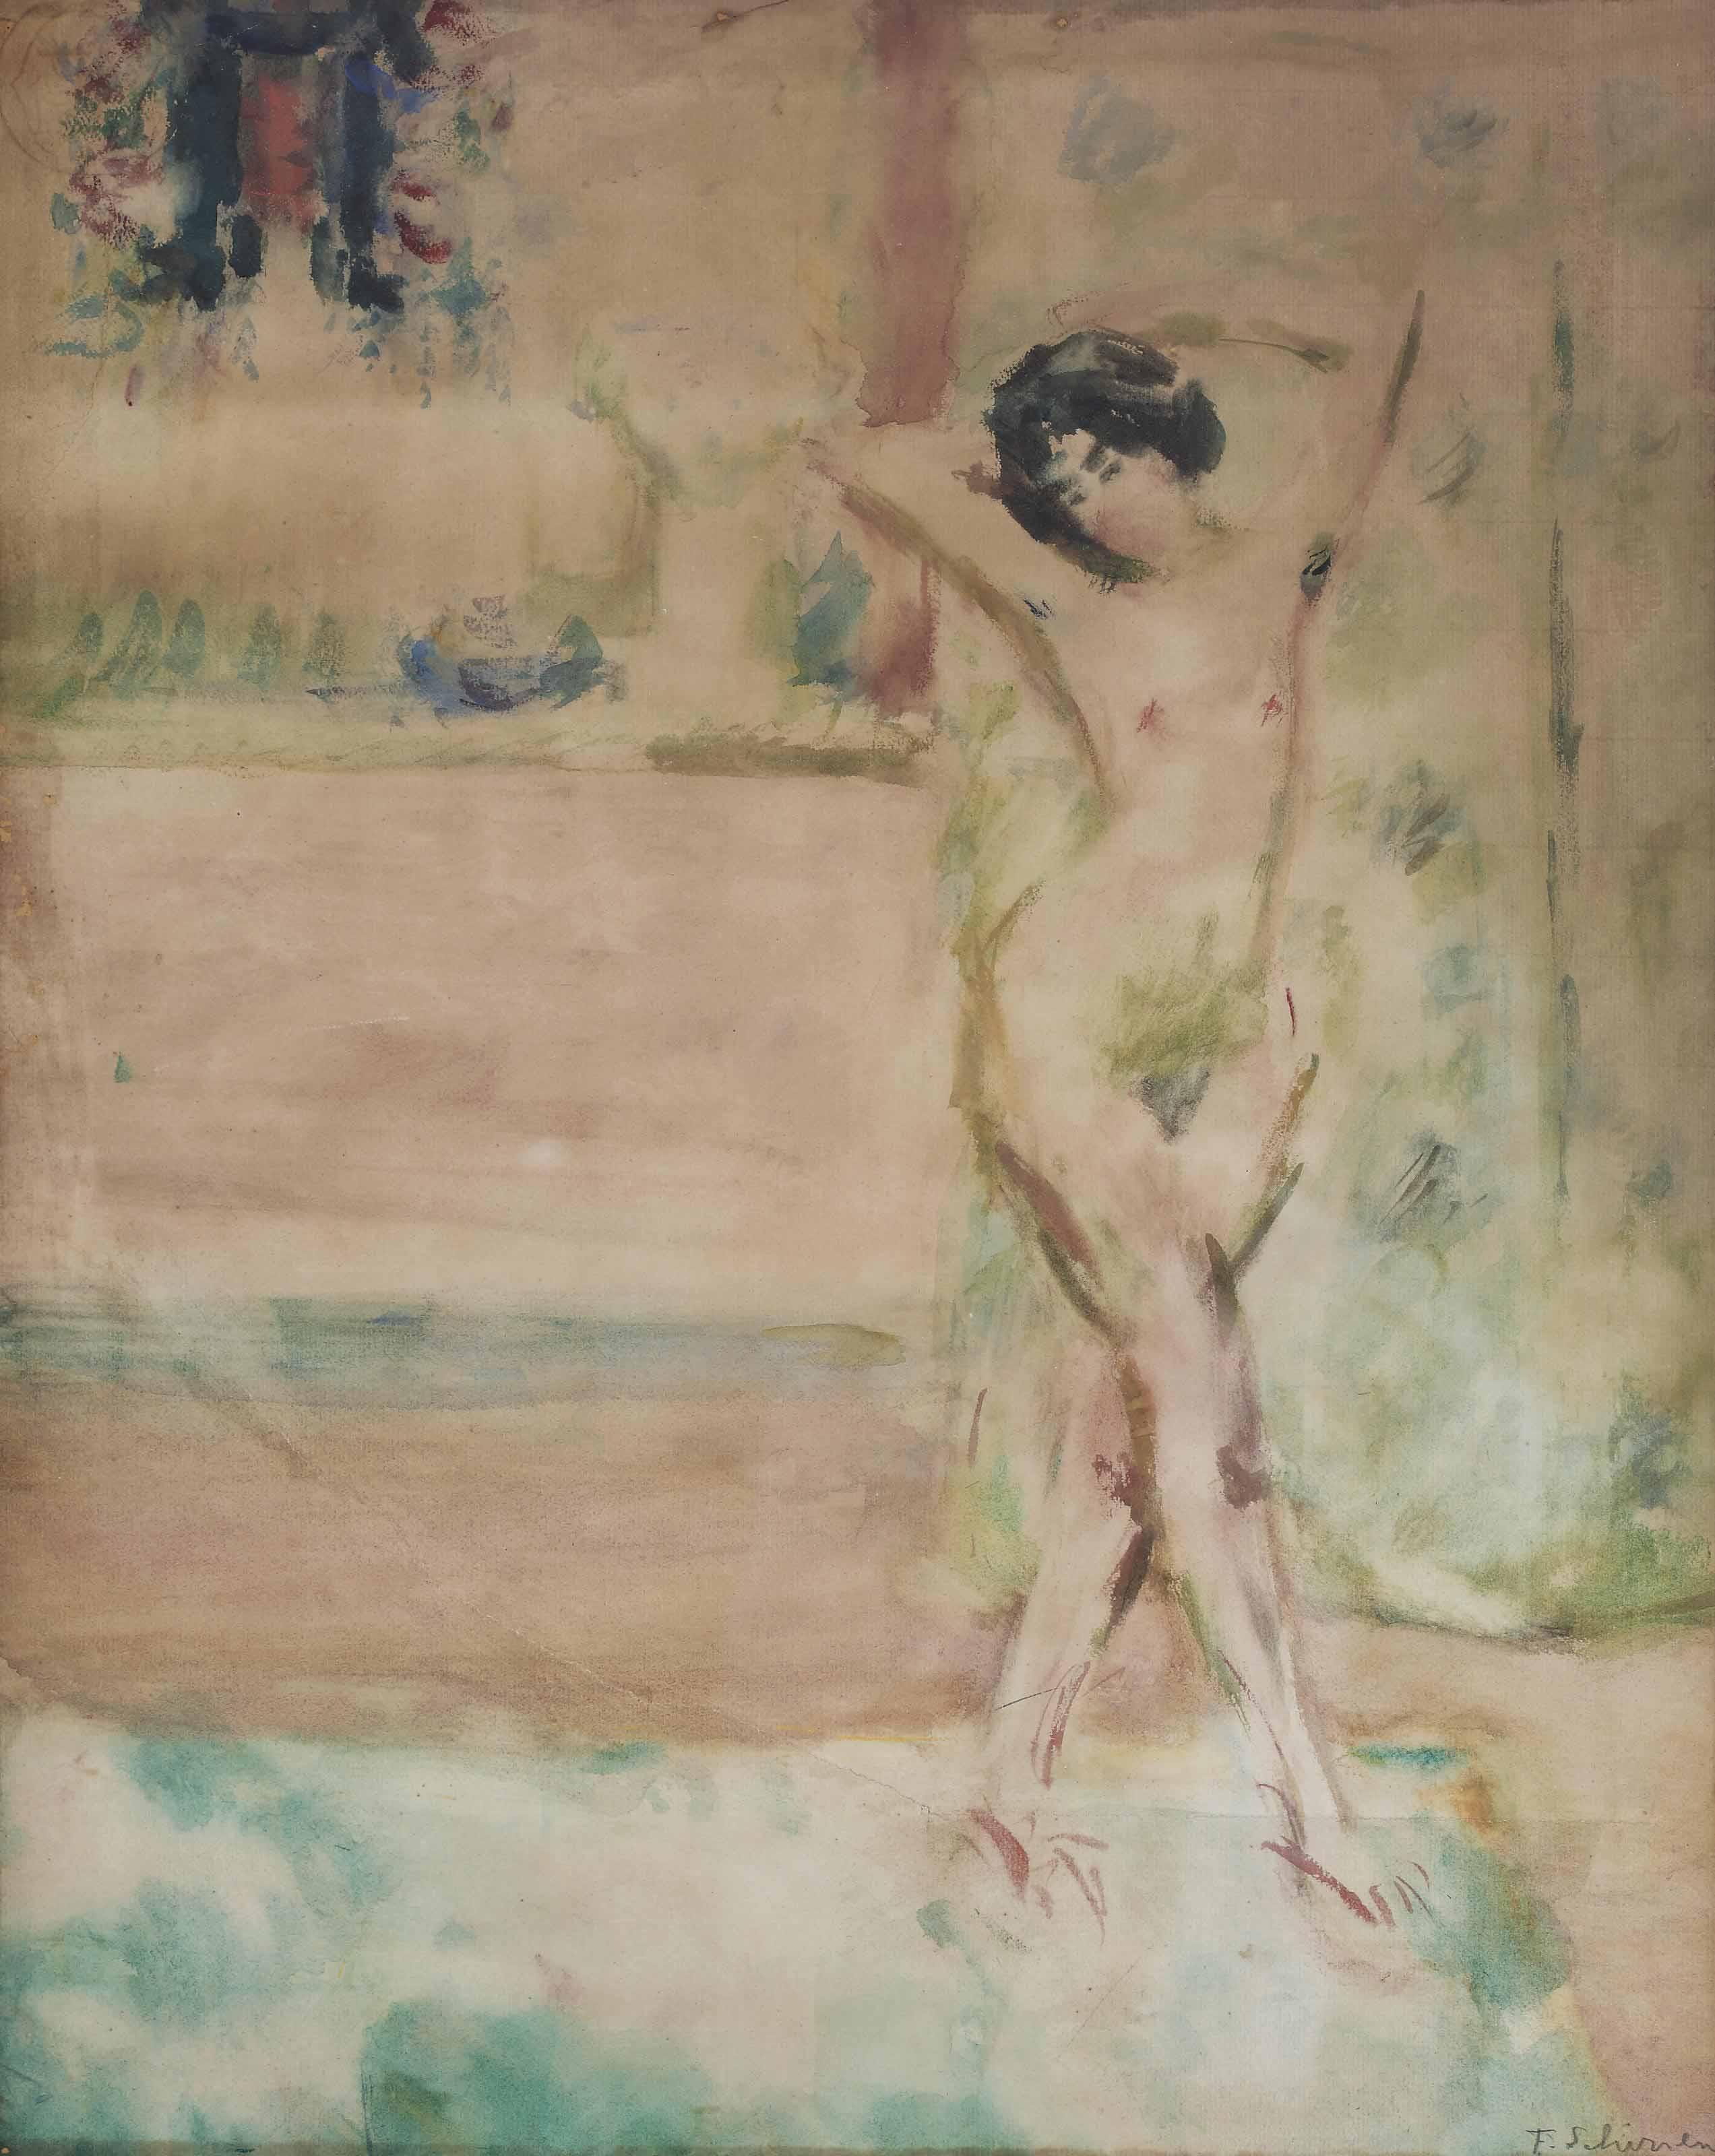 A posing nude